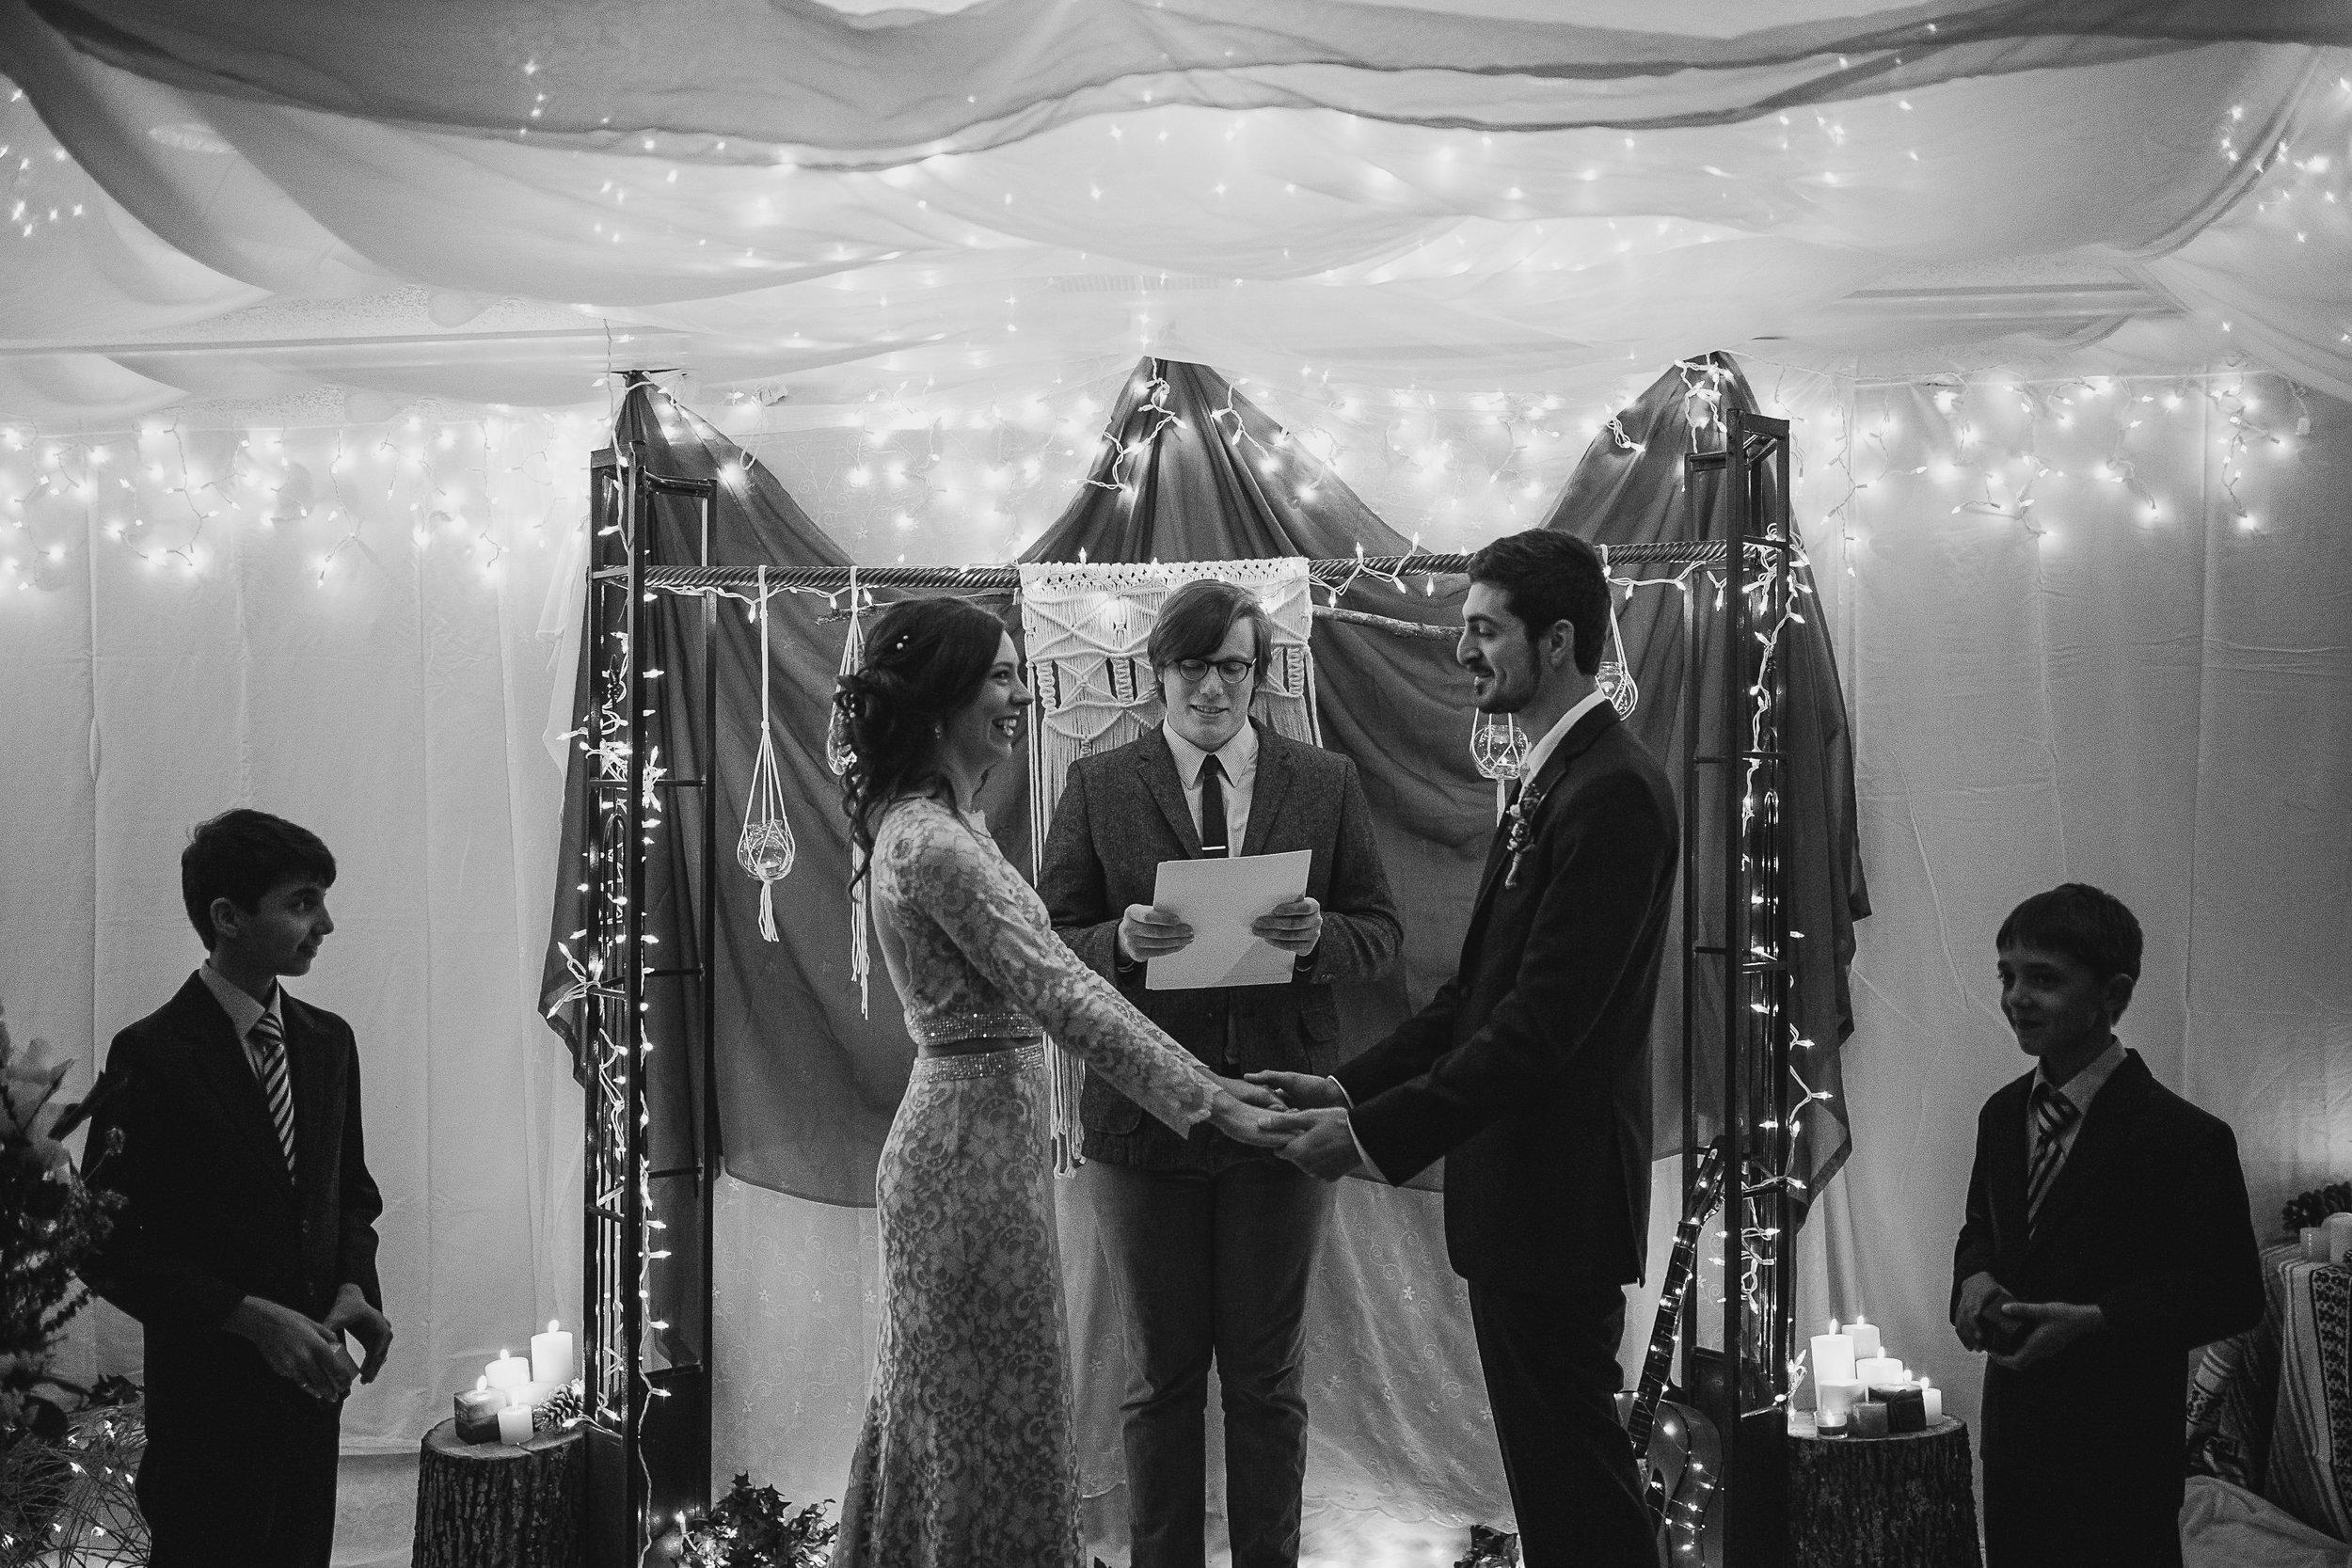 cassie-cook-photographer-intimate-ceremony-elopement